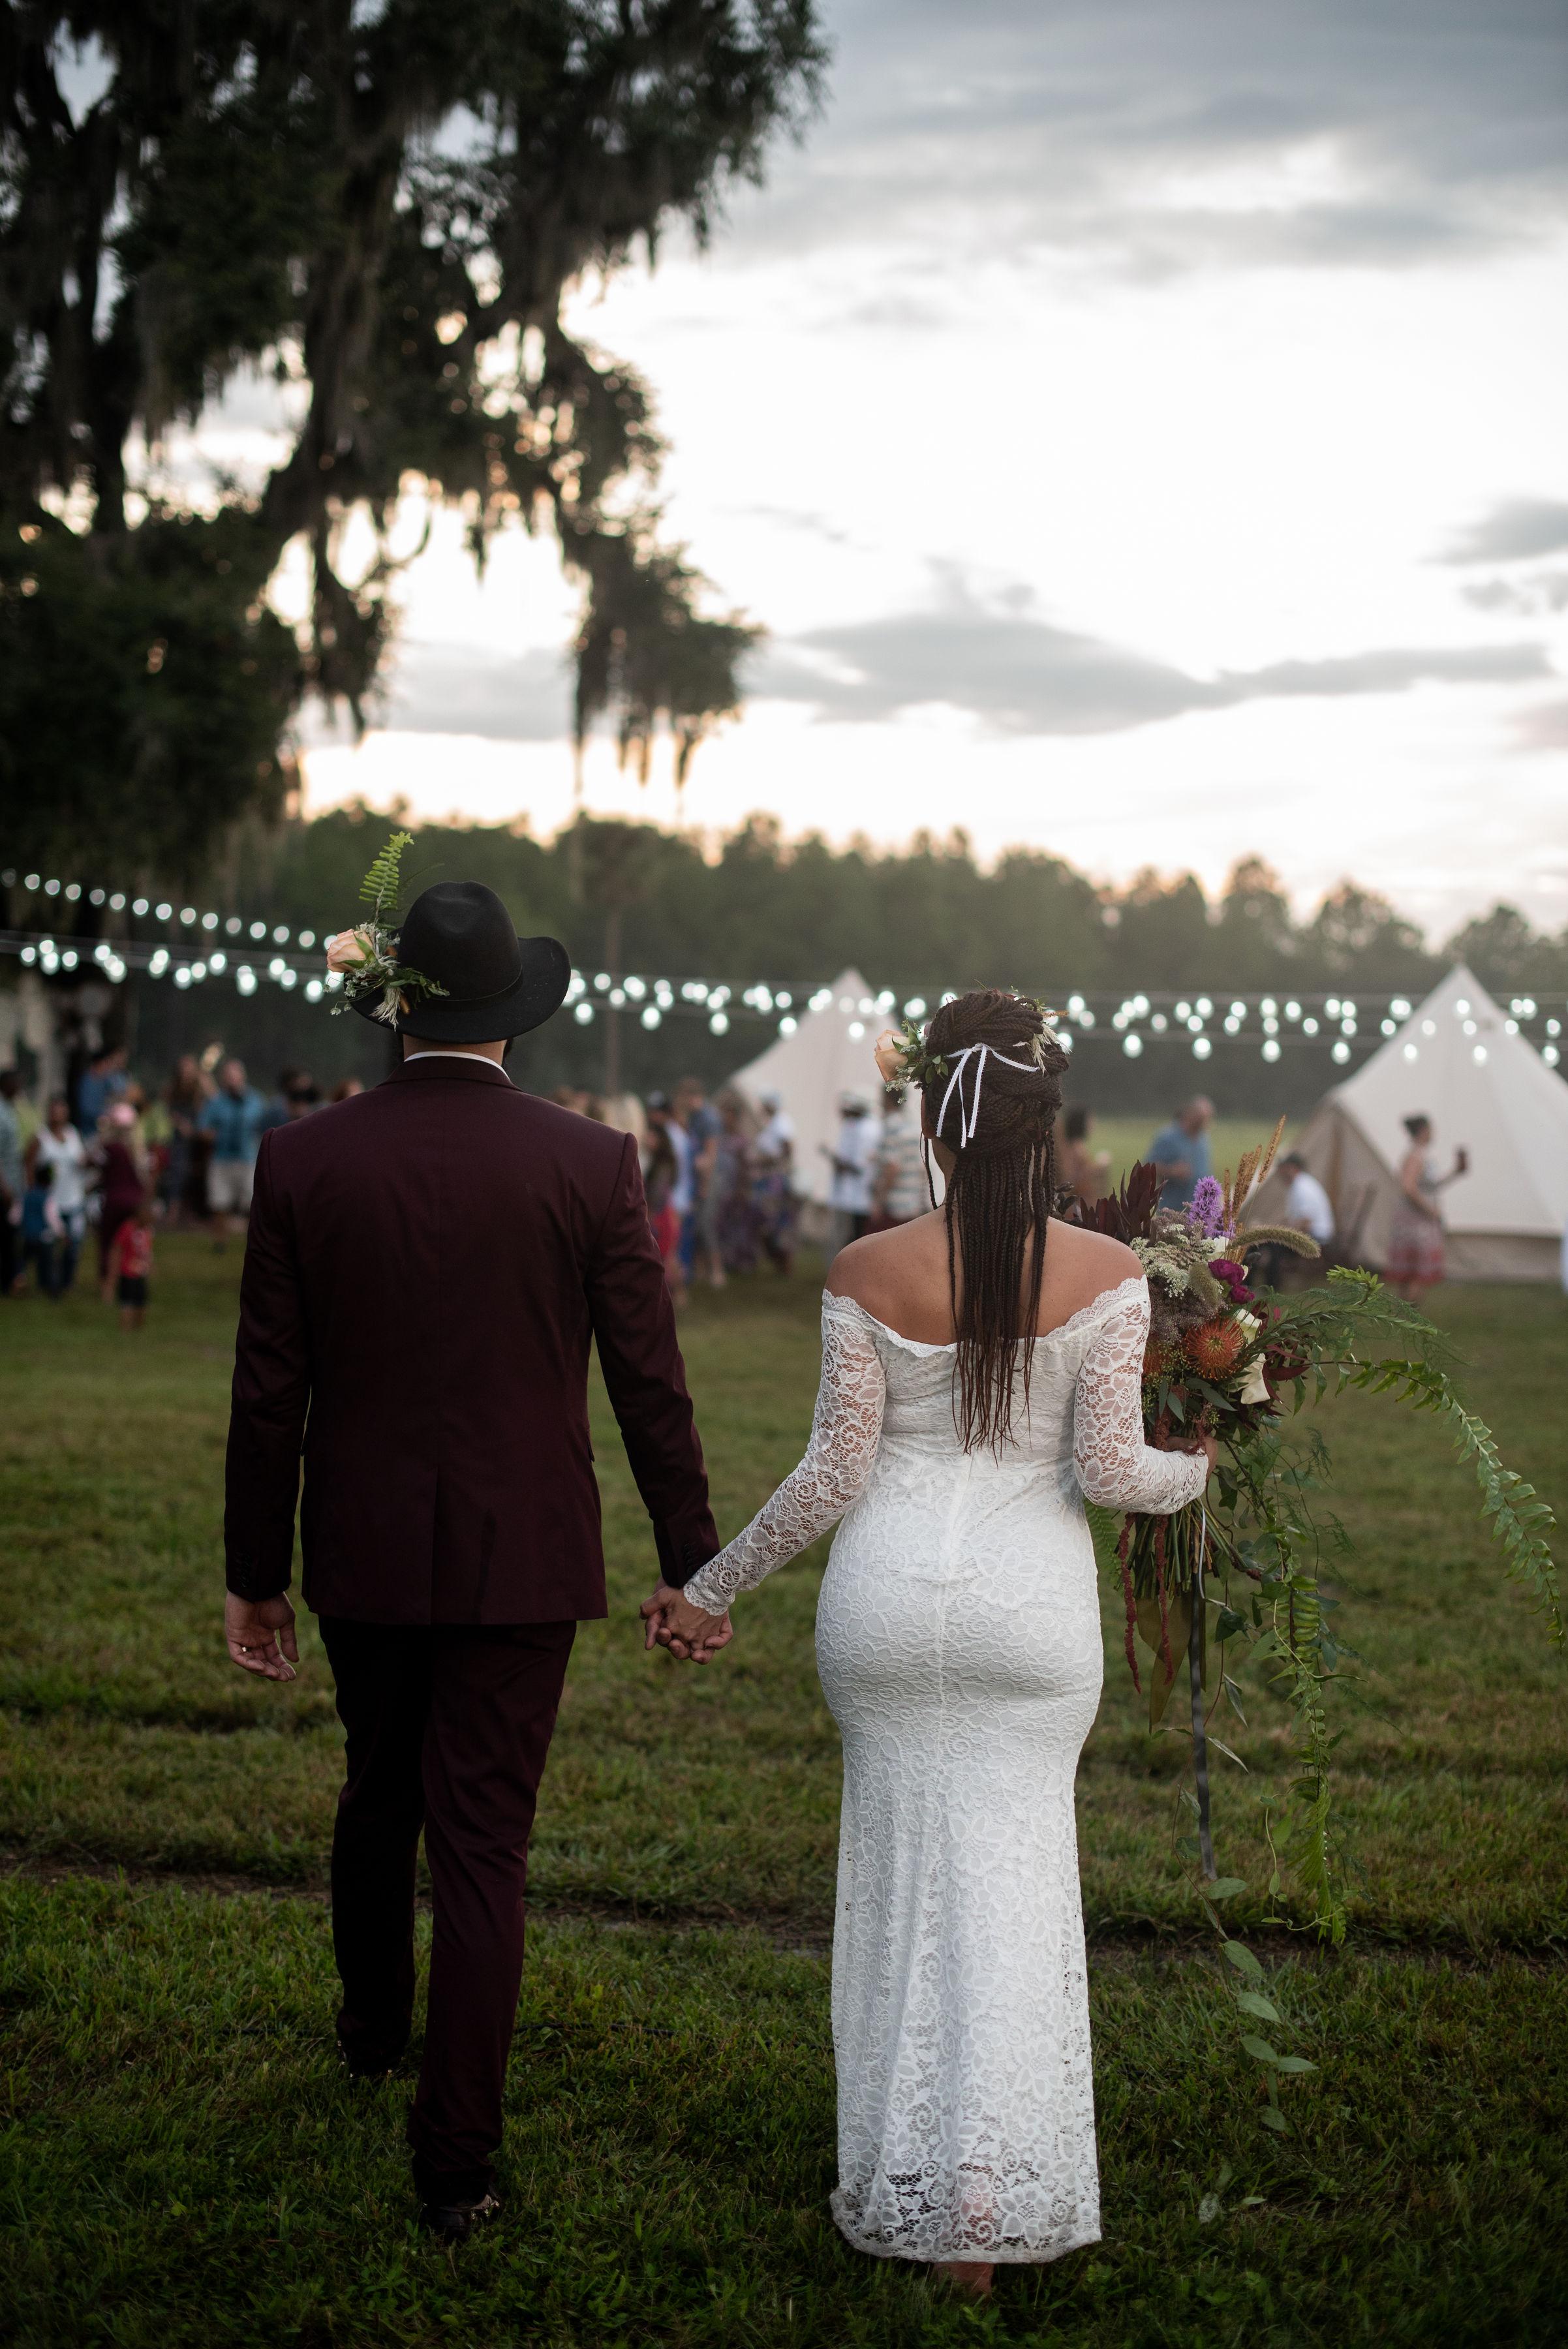 st-augustine-photographer-sarah-annay-wedfest2018-265.jpg